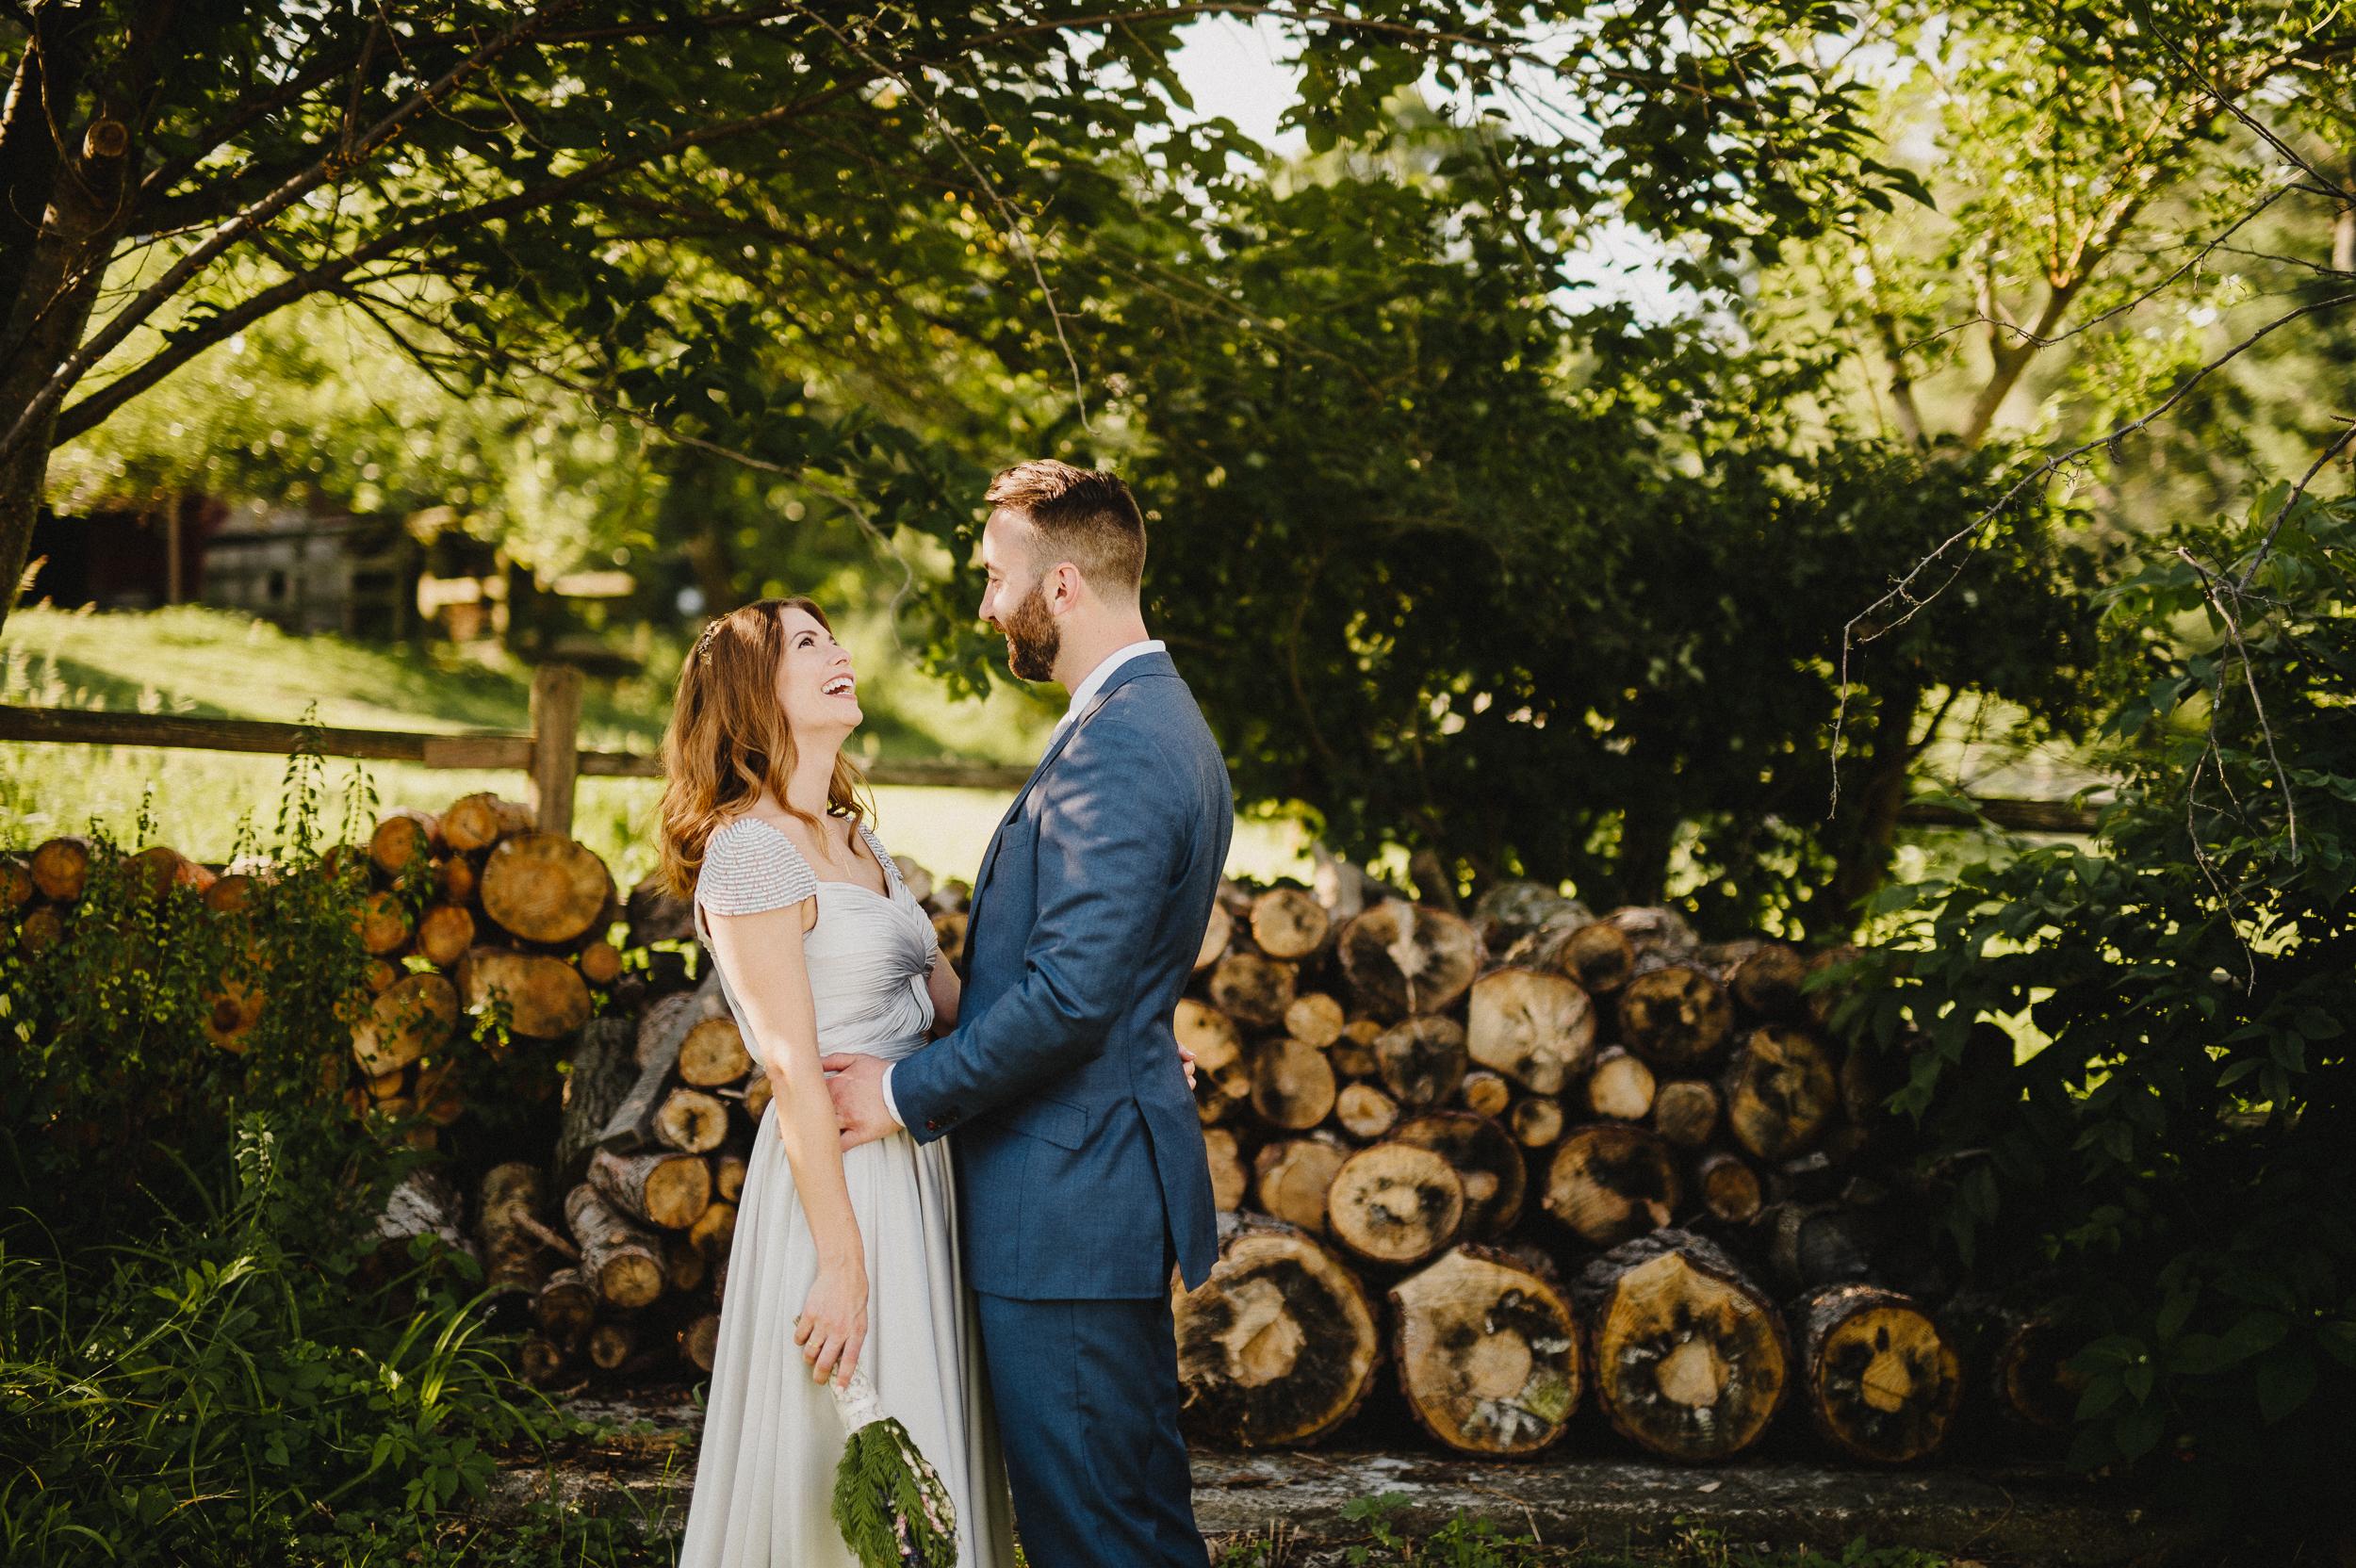 Pioneer-farms-warwick-new-york-wedding-photographer049.jpg